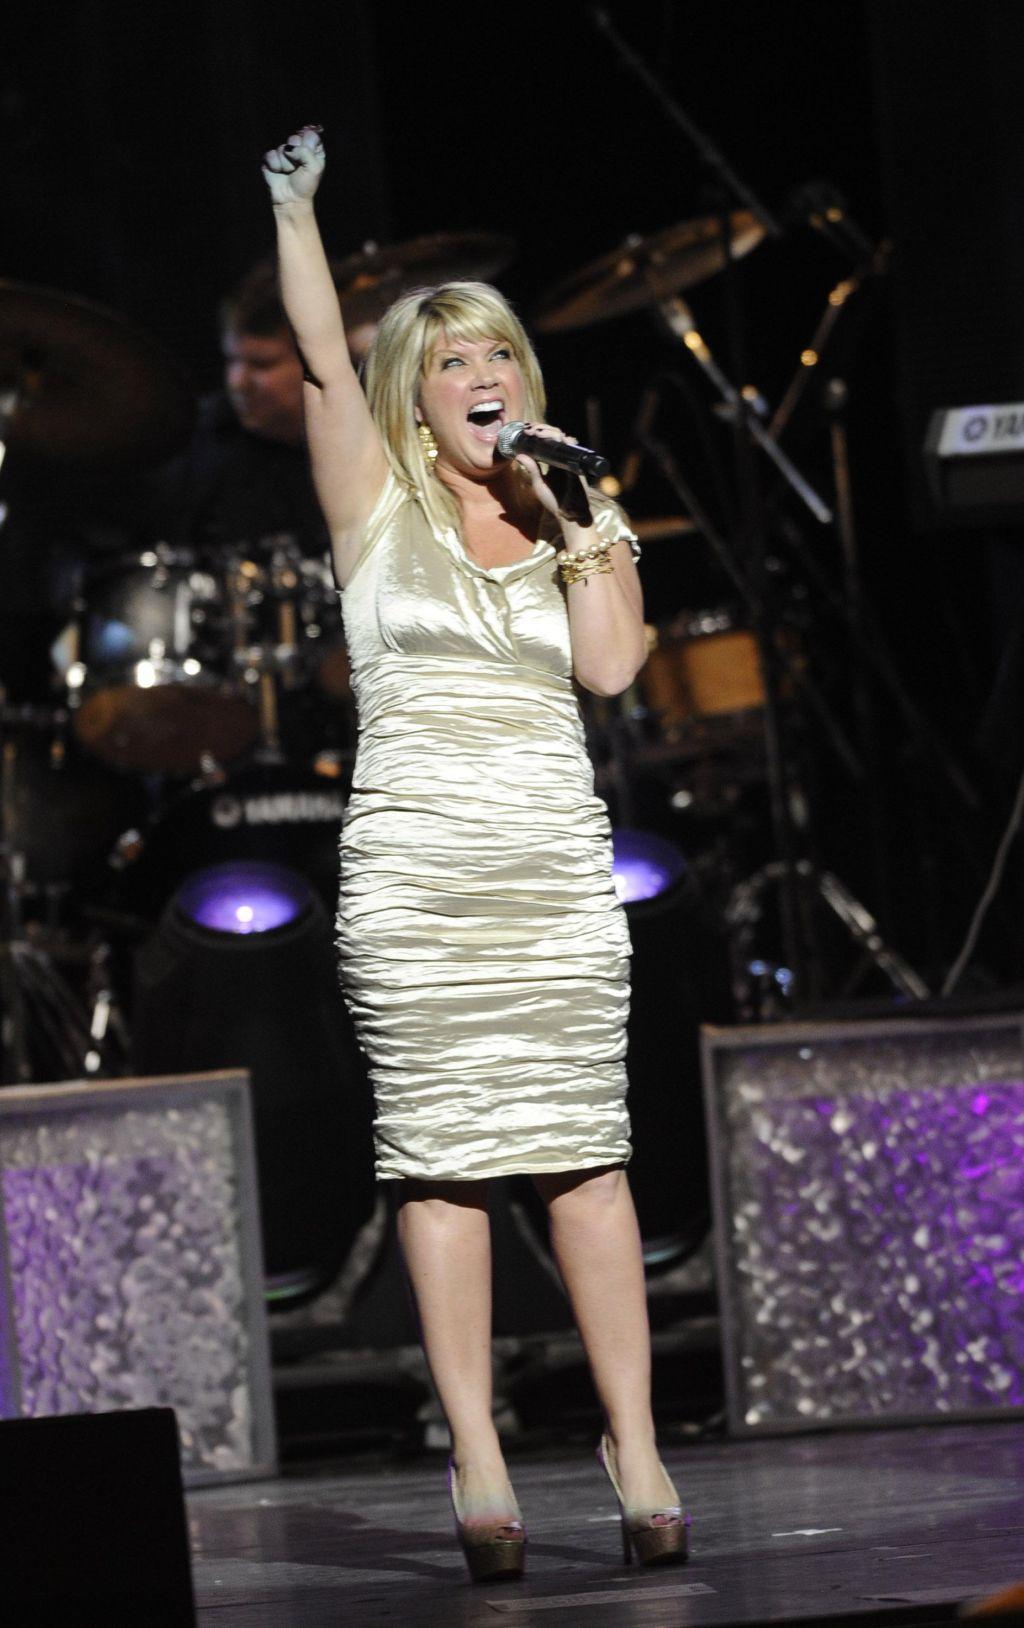 43rd Annual GMA Dove Awards - Show